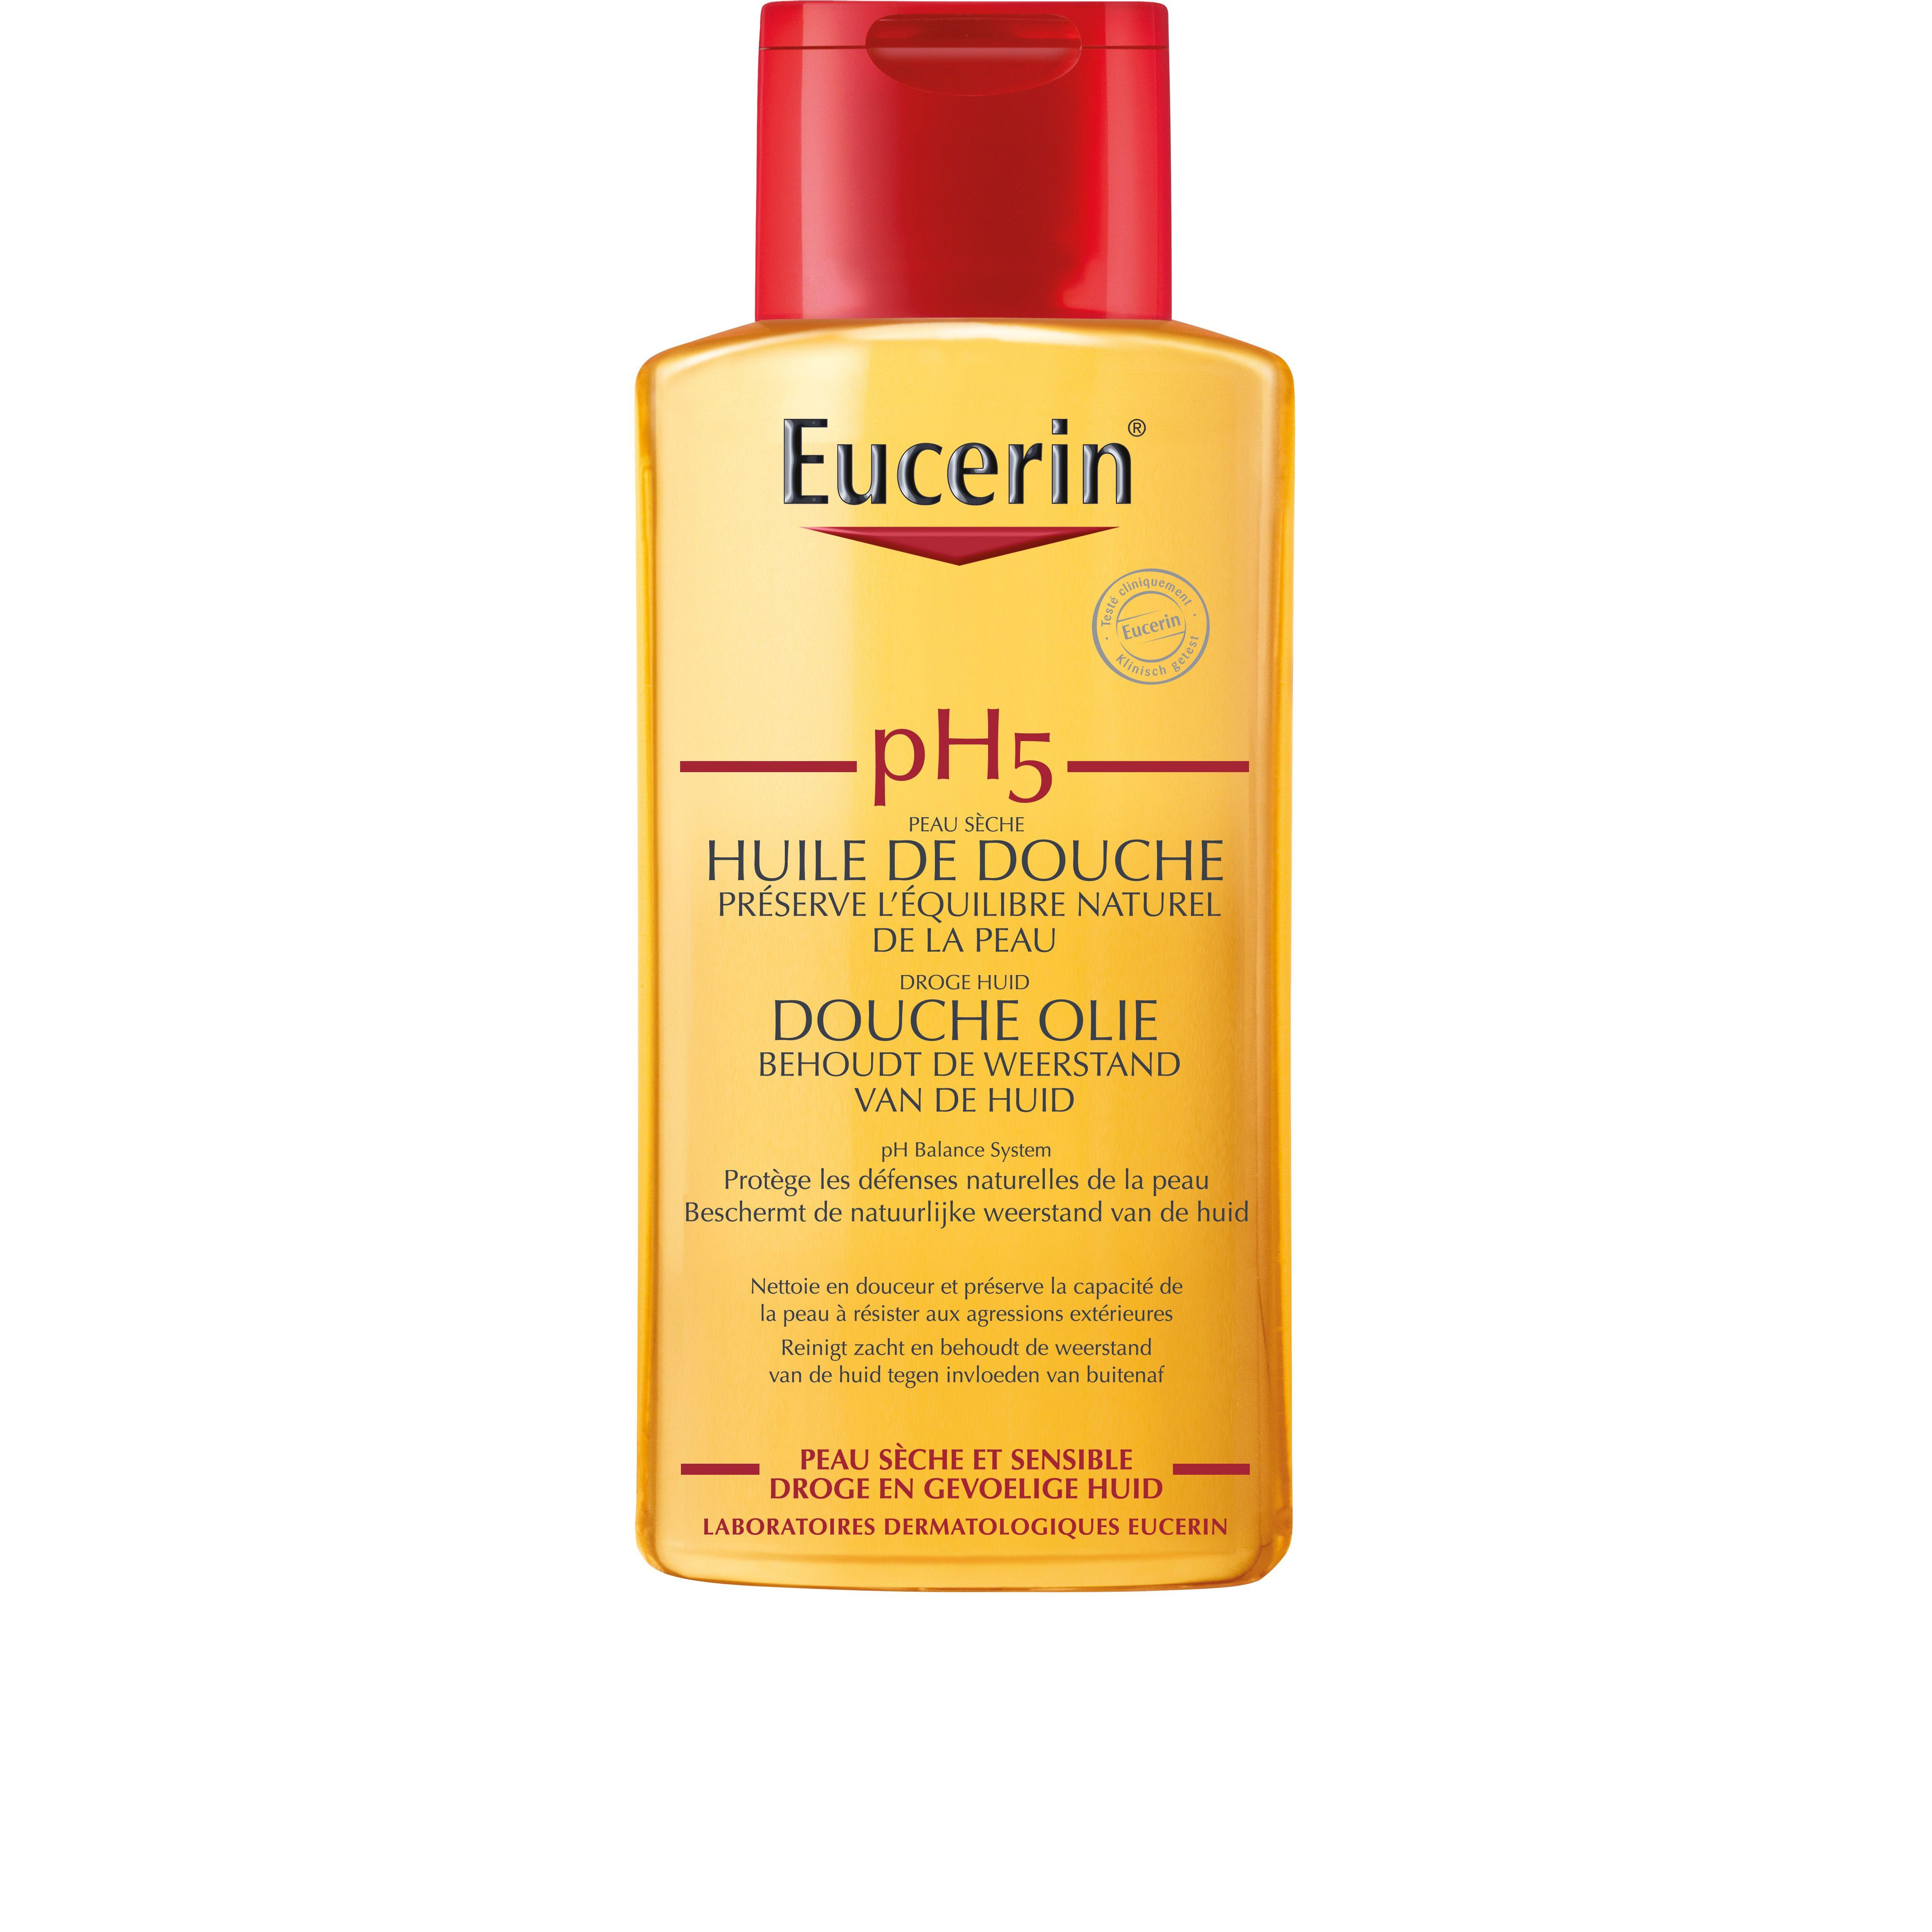 Eucerin Ph5 Creme-doucheolie 200ml